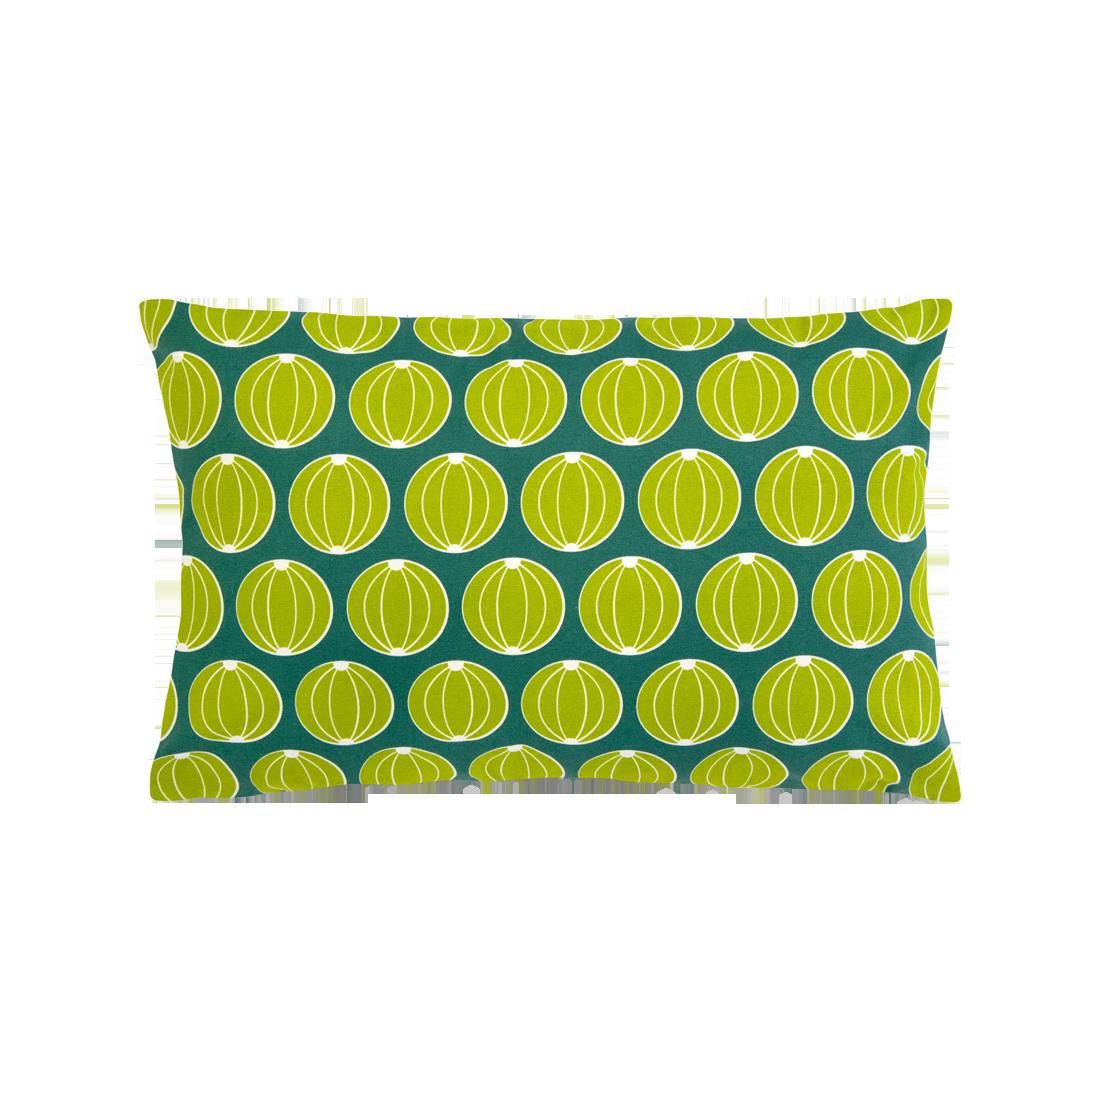 Coussin Melons 68x44 vert jade - FERMOB